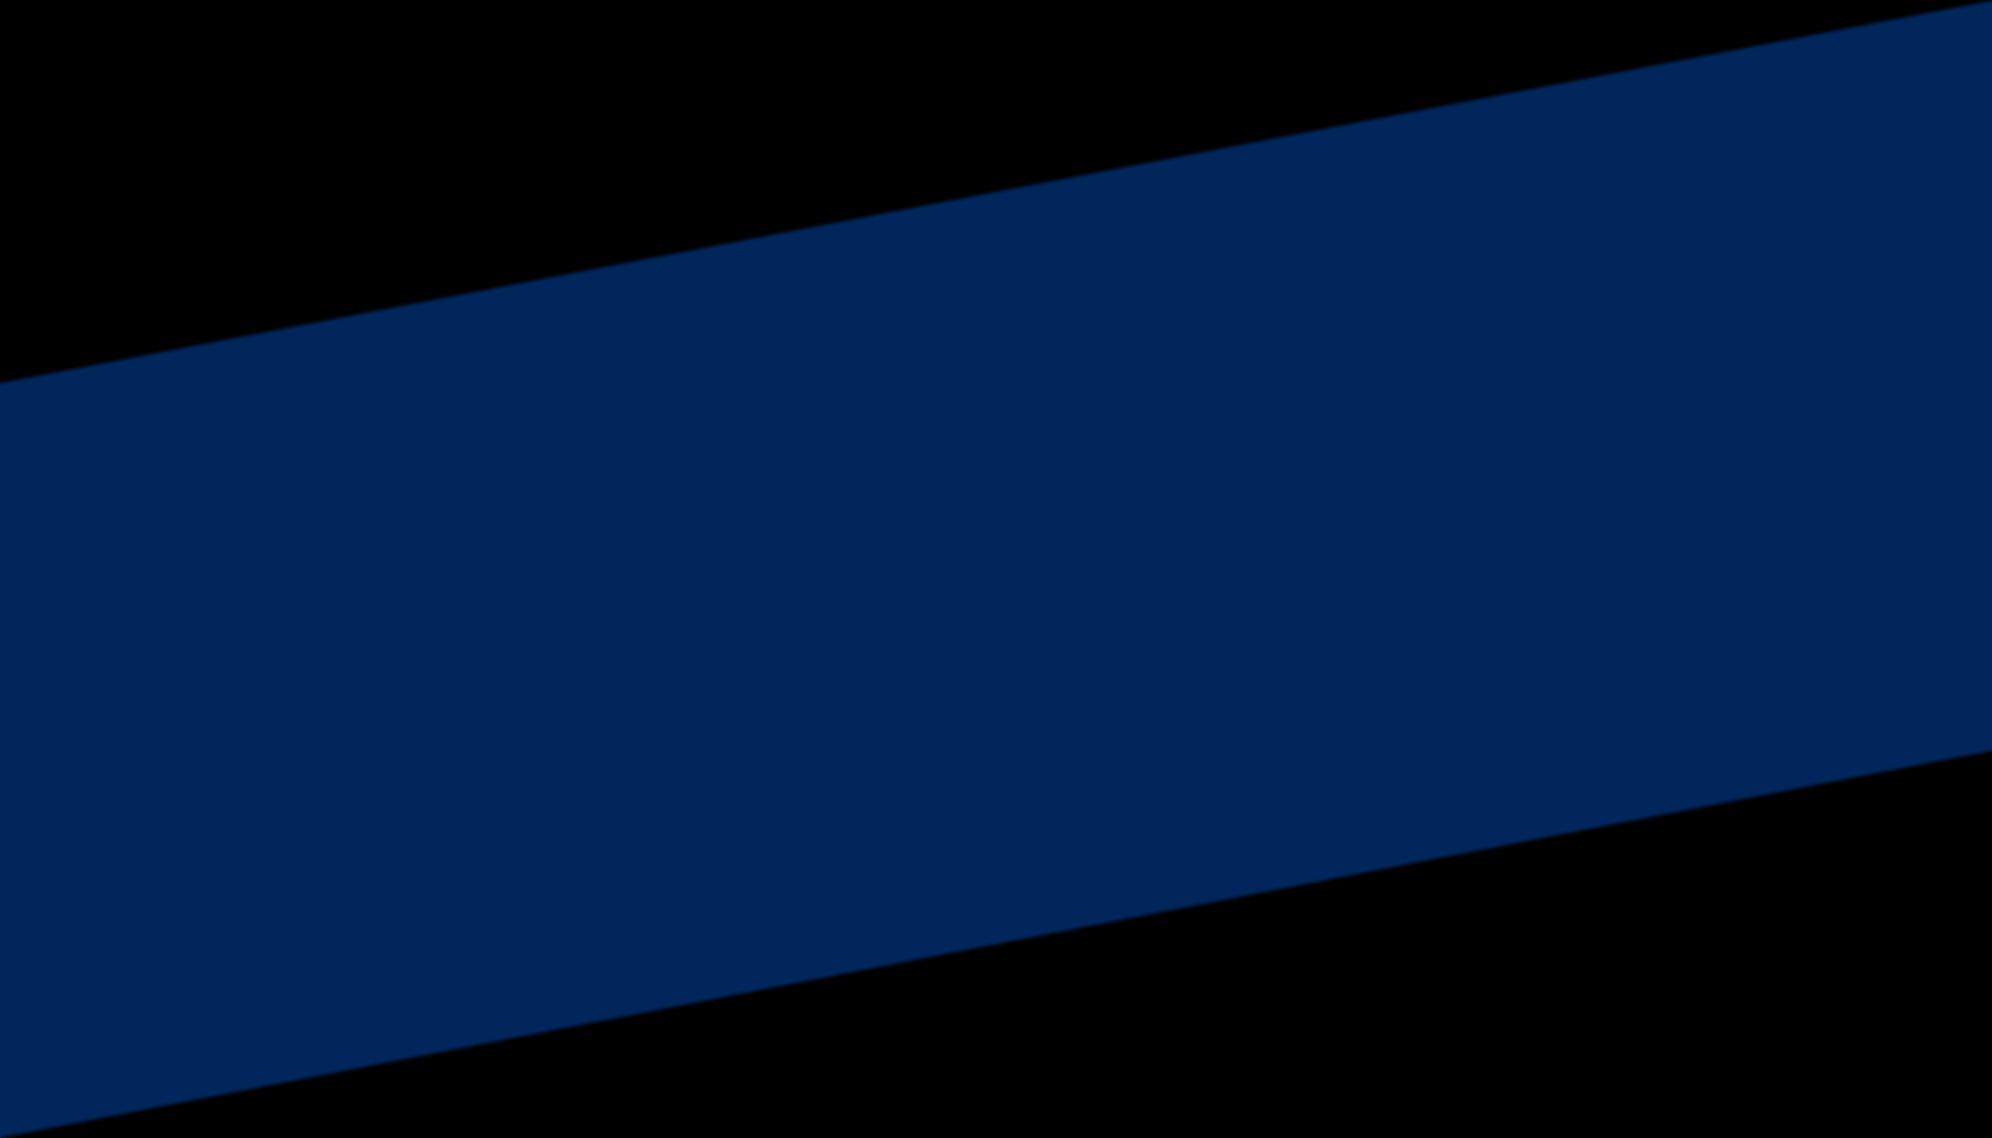 banner-produtos-e-serviços.png